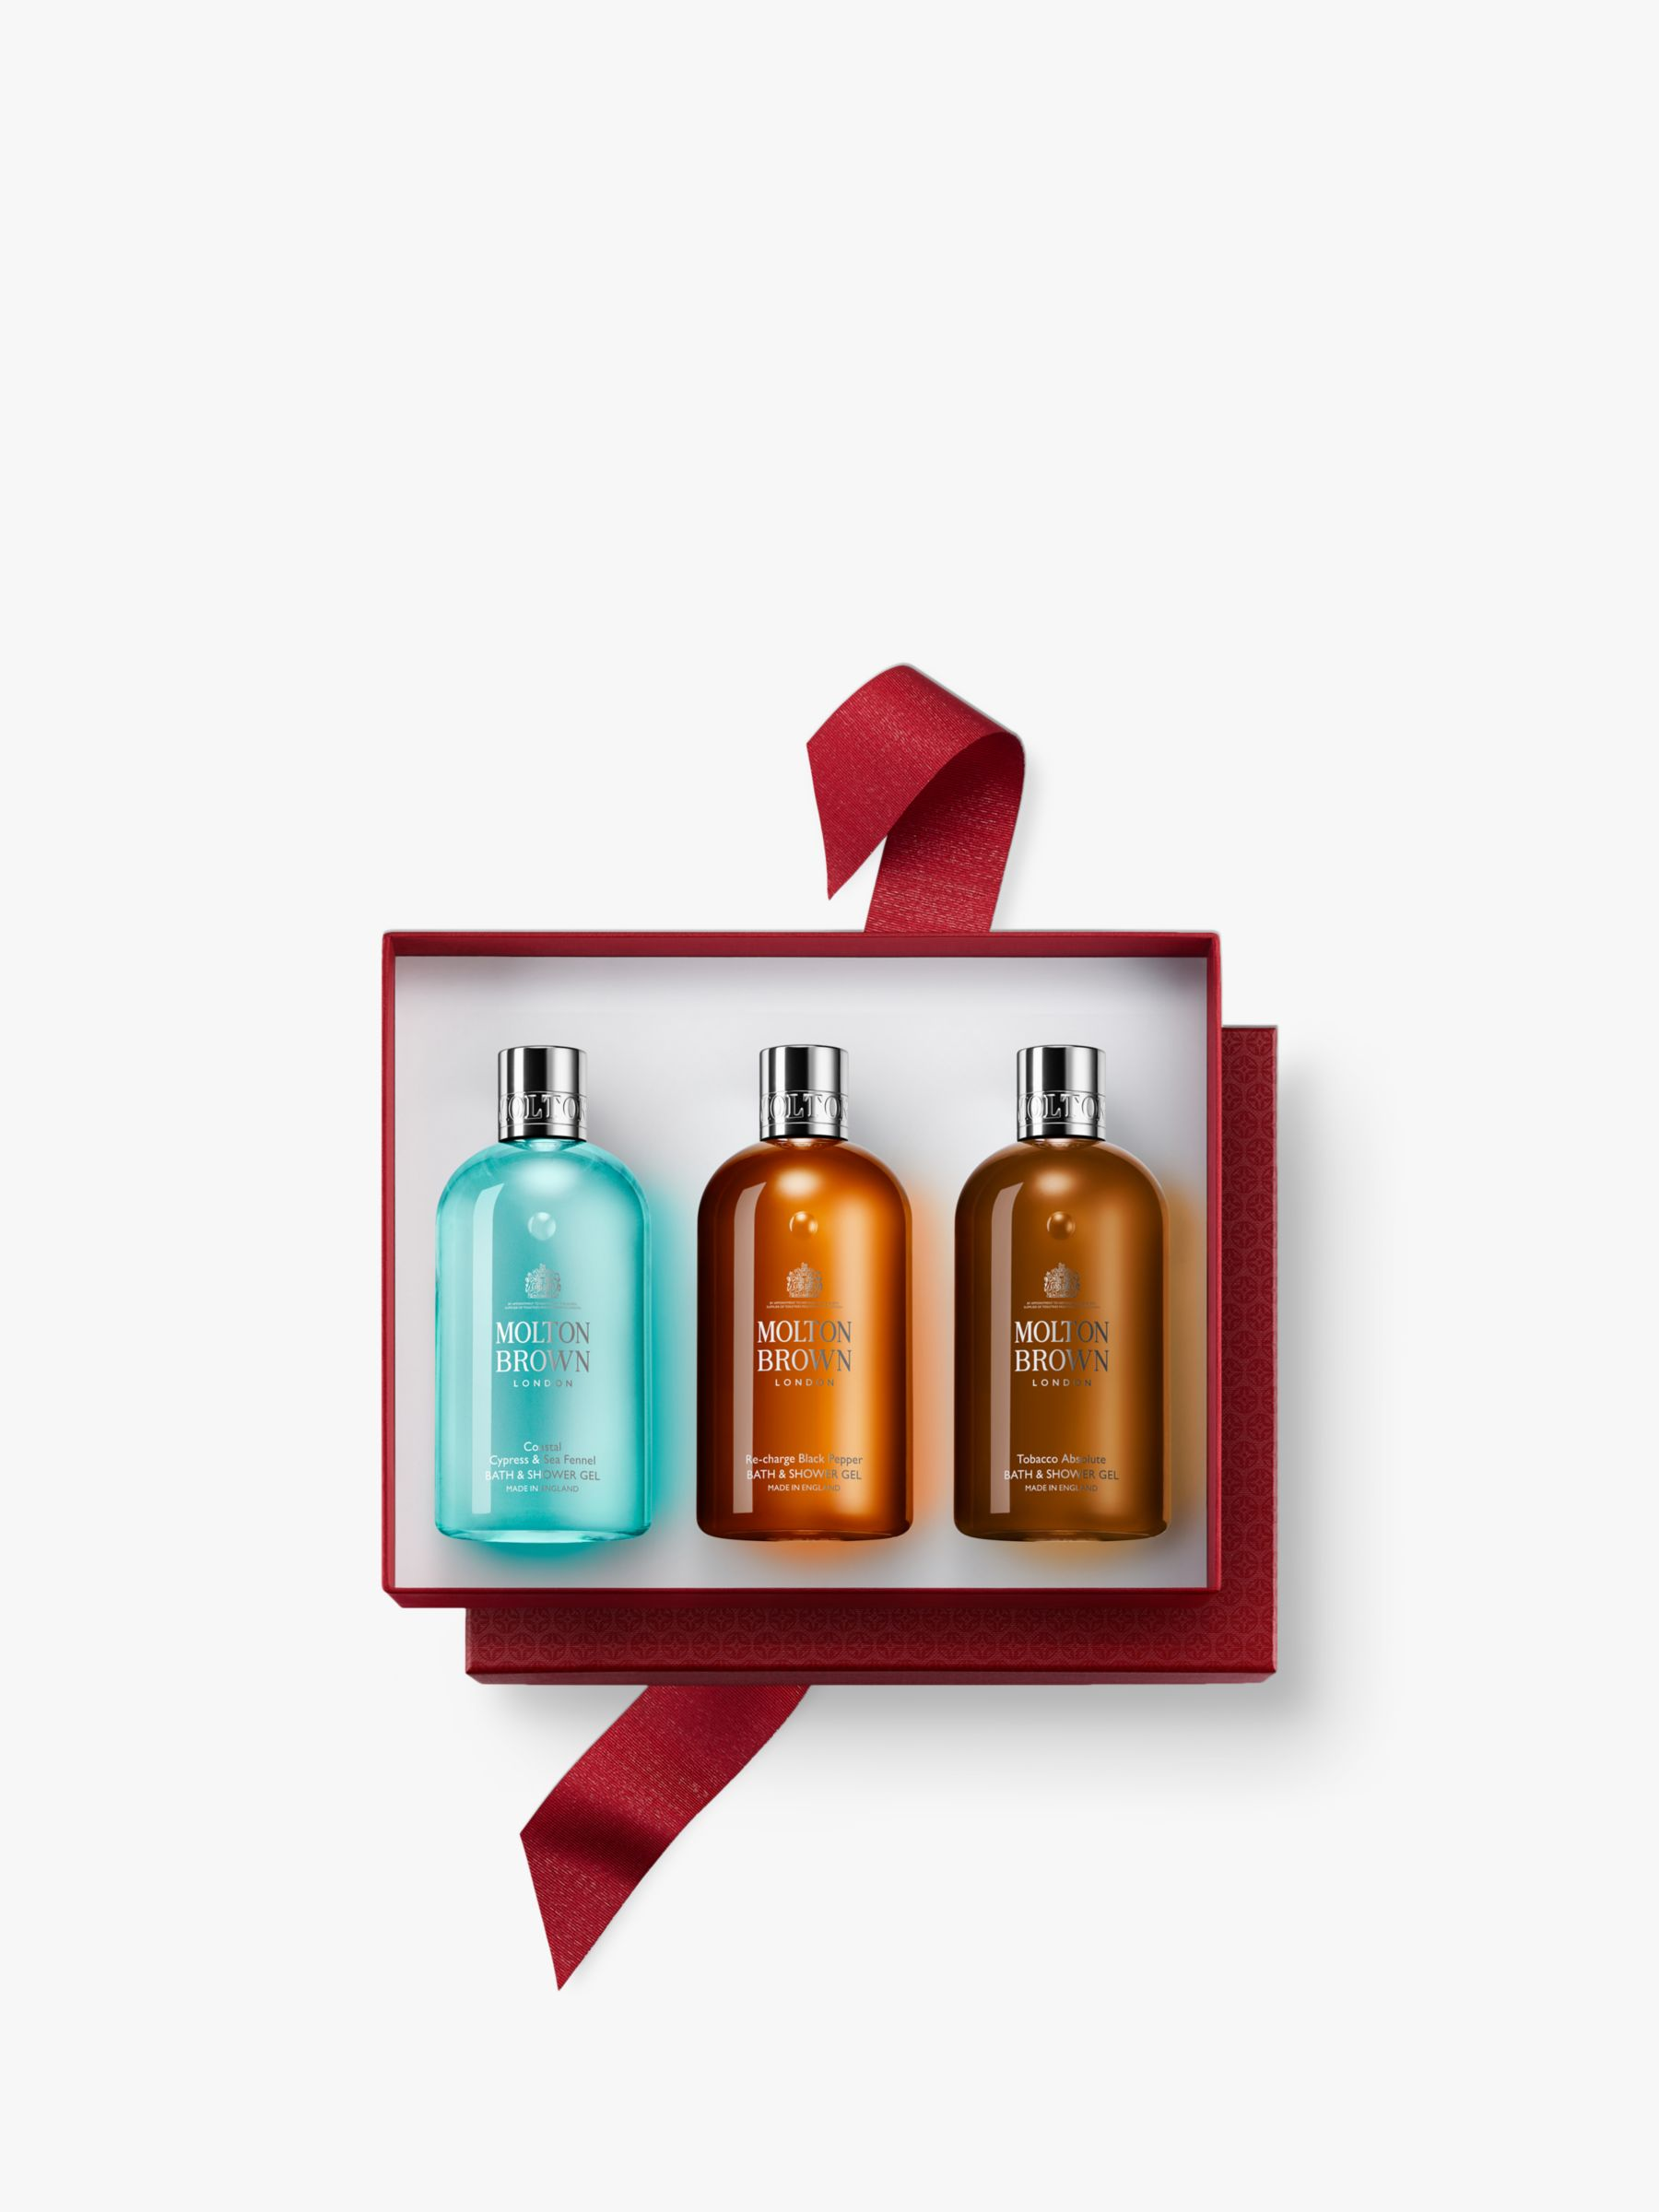 Molton Brown Adventurous Experiences Men Gel Trio Body Care Gift Set At John Lewis Partners